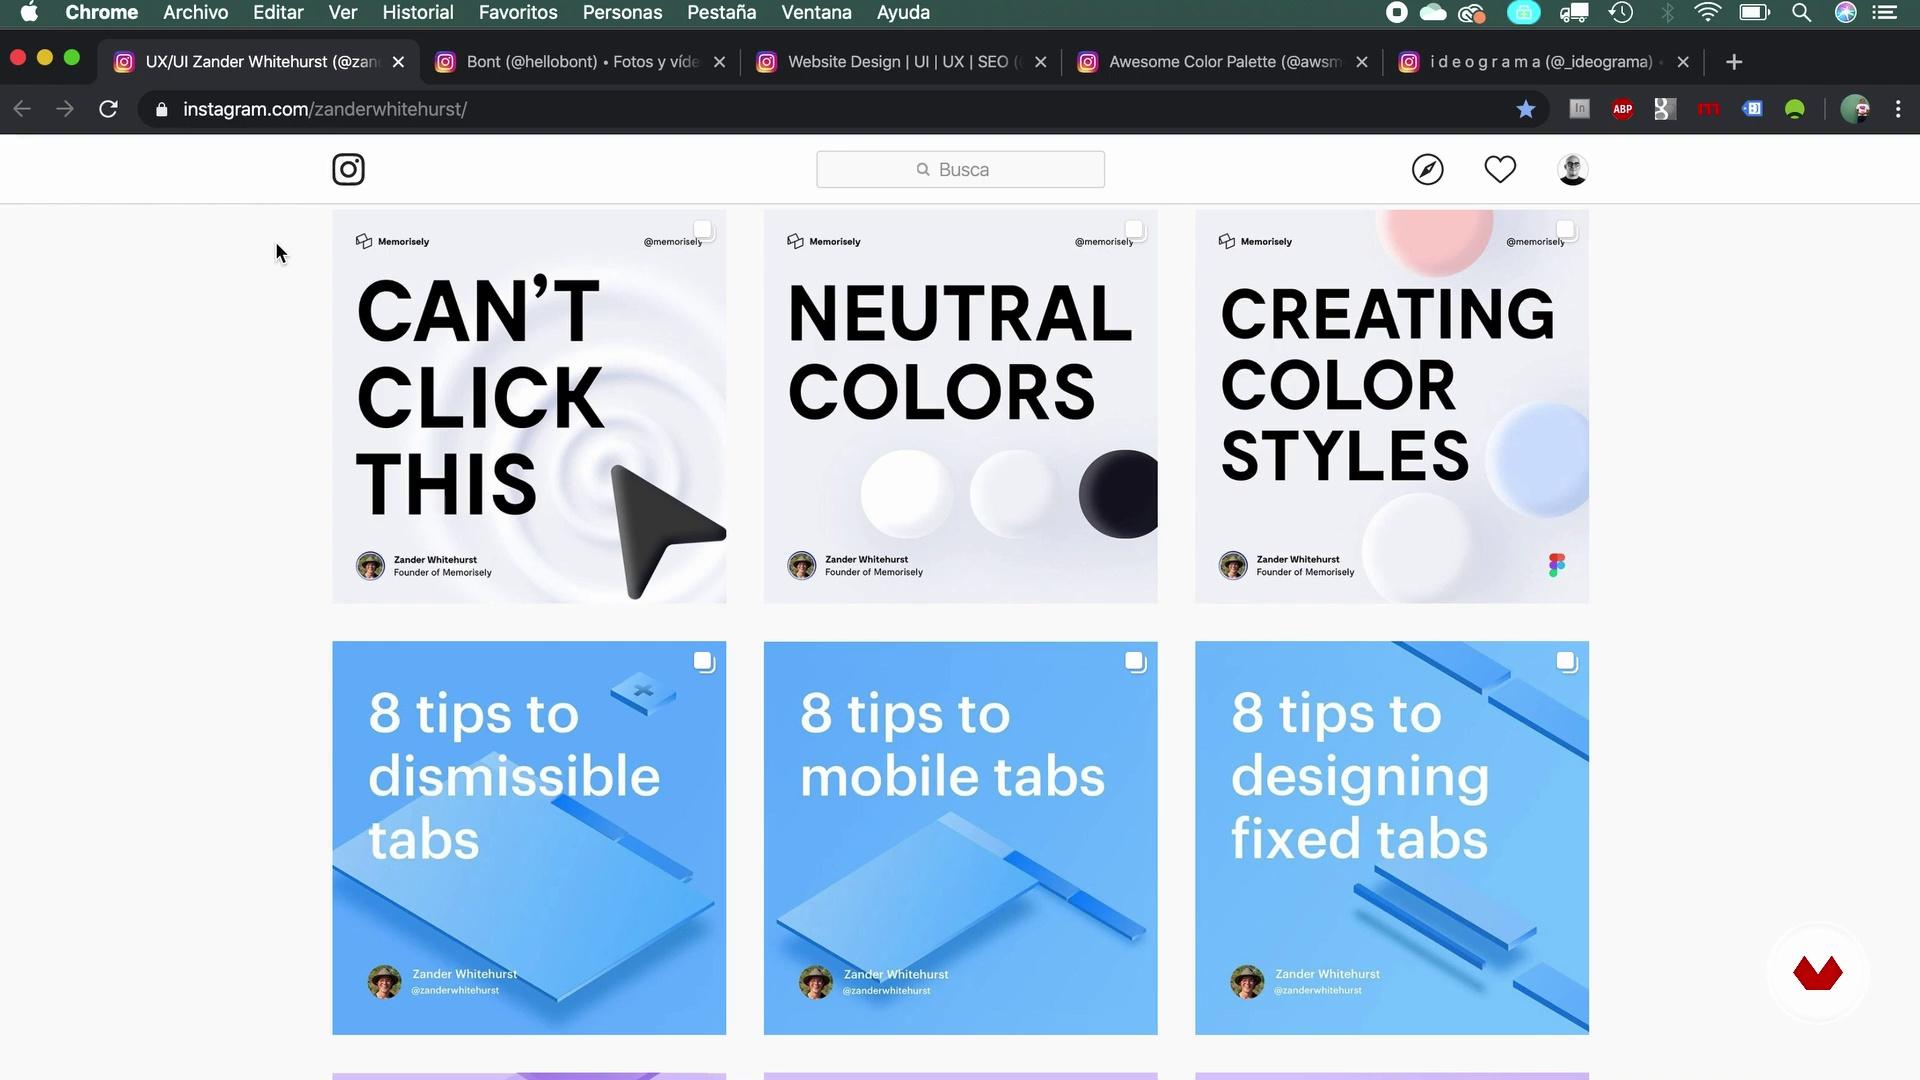 Influences Responsive Web Design With Adobe Dreamweaver Monkylab Domestika